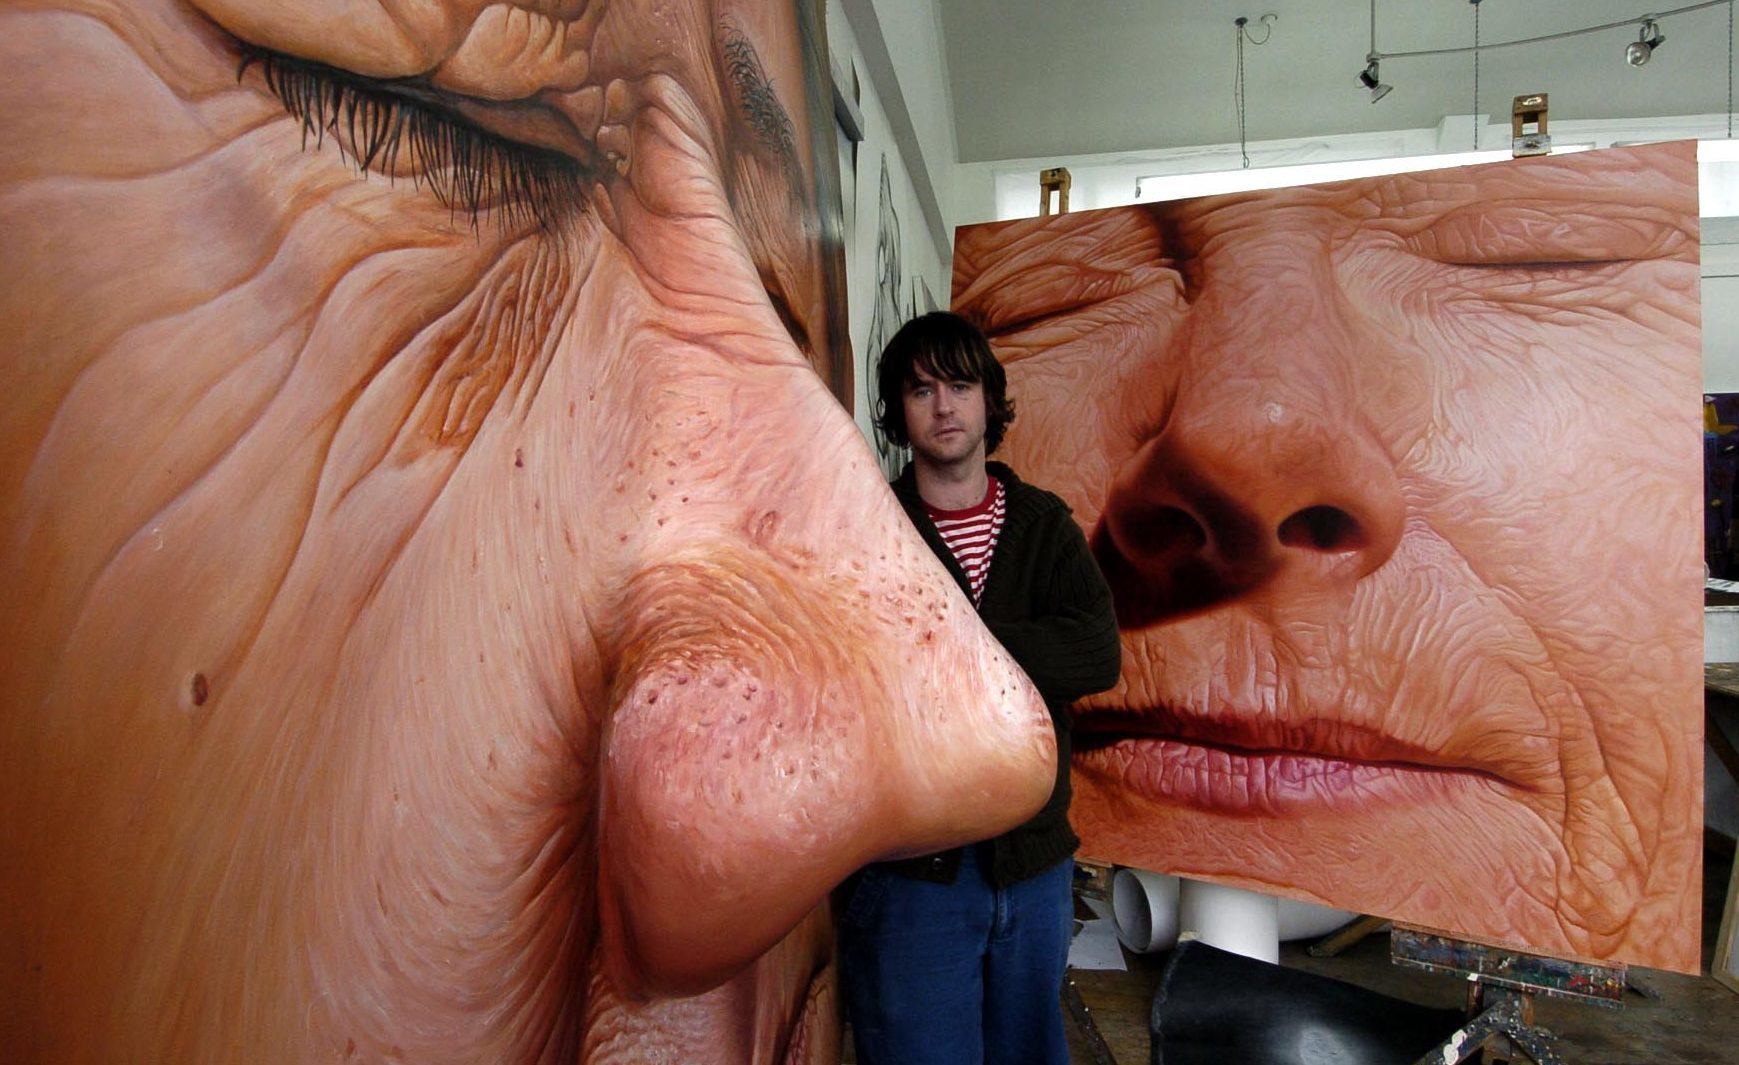 Simon Reekie at Duncan of Jordanstone College of Art in 2004